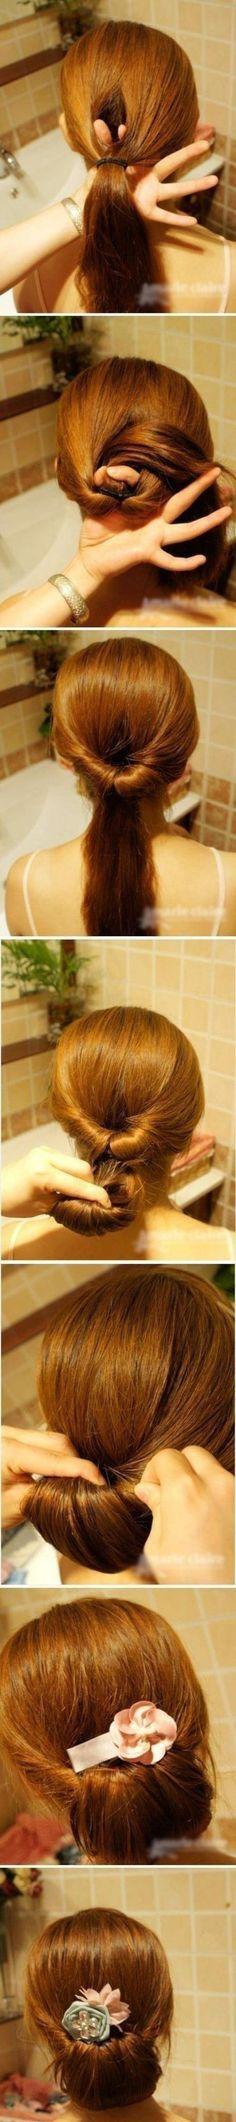 hair-styles-18